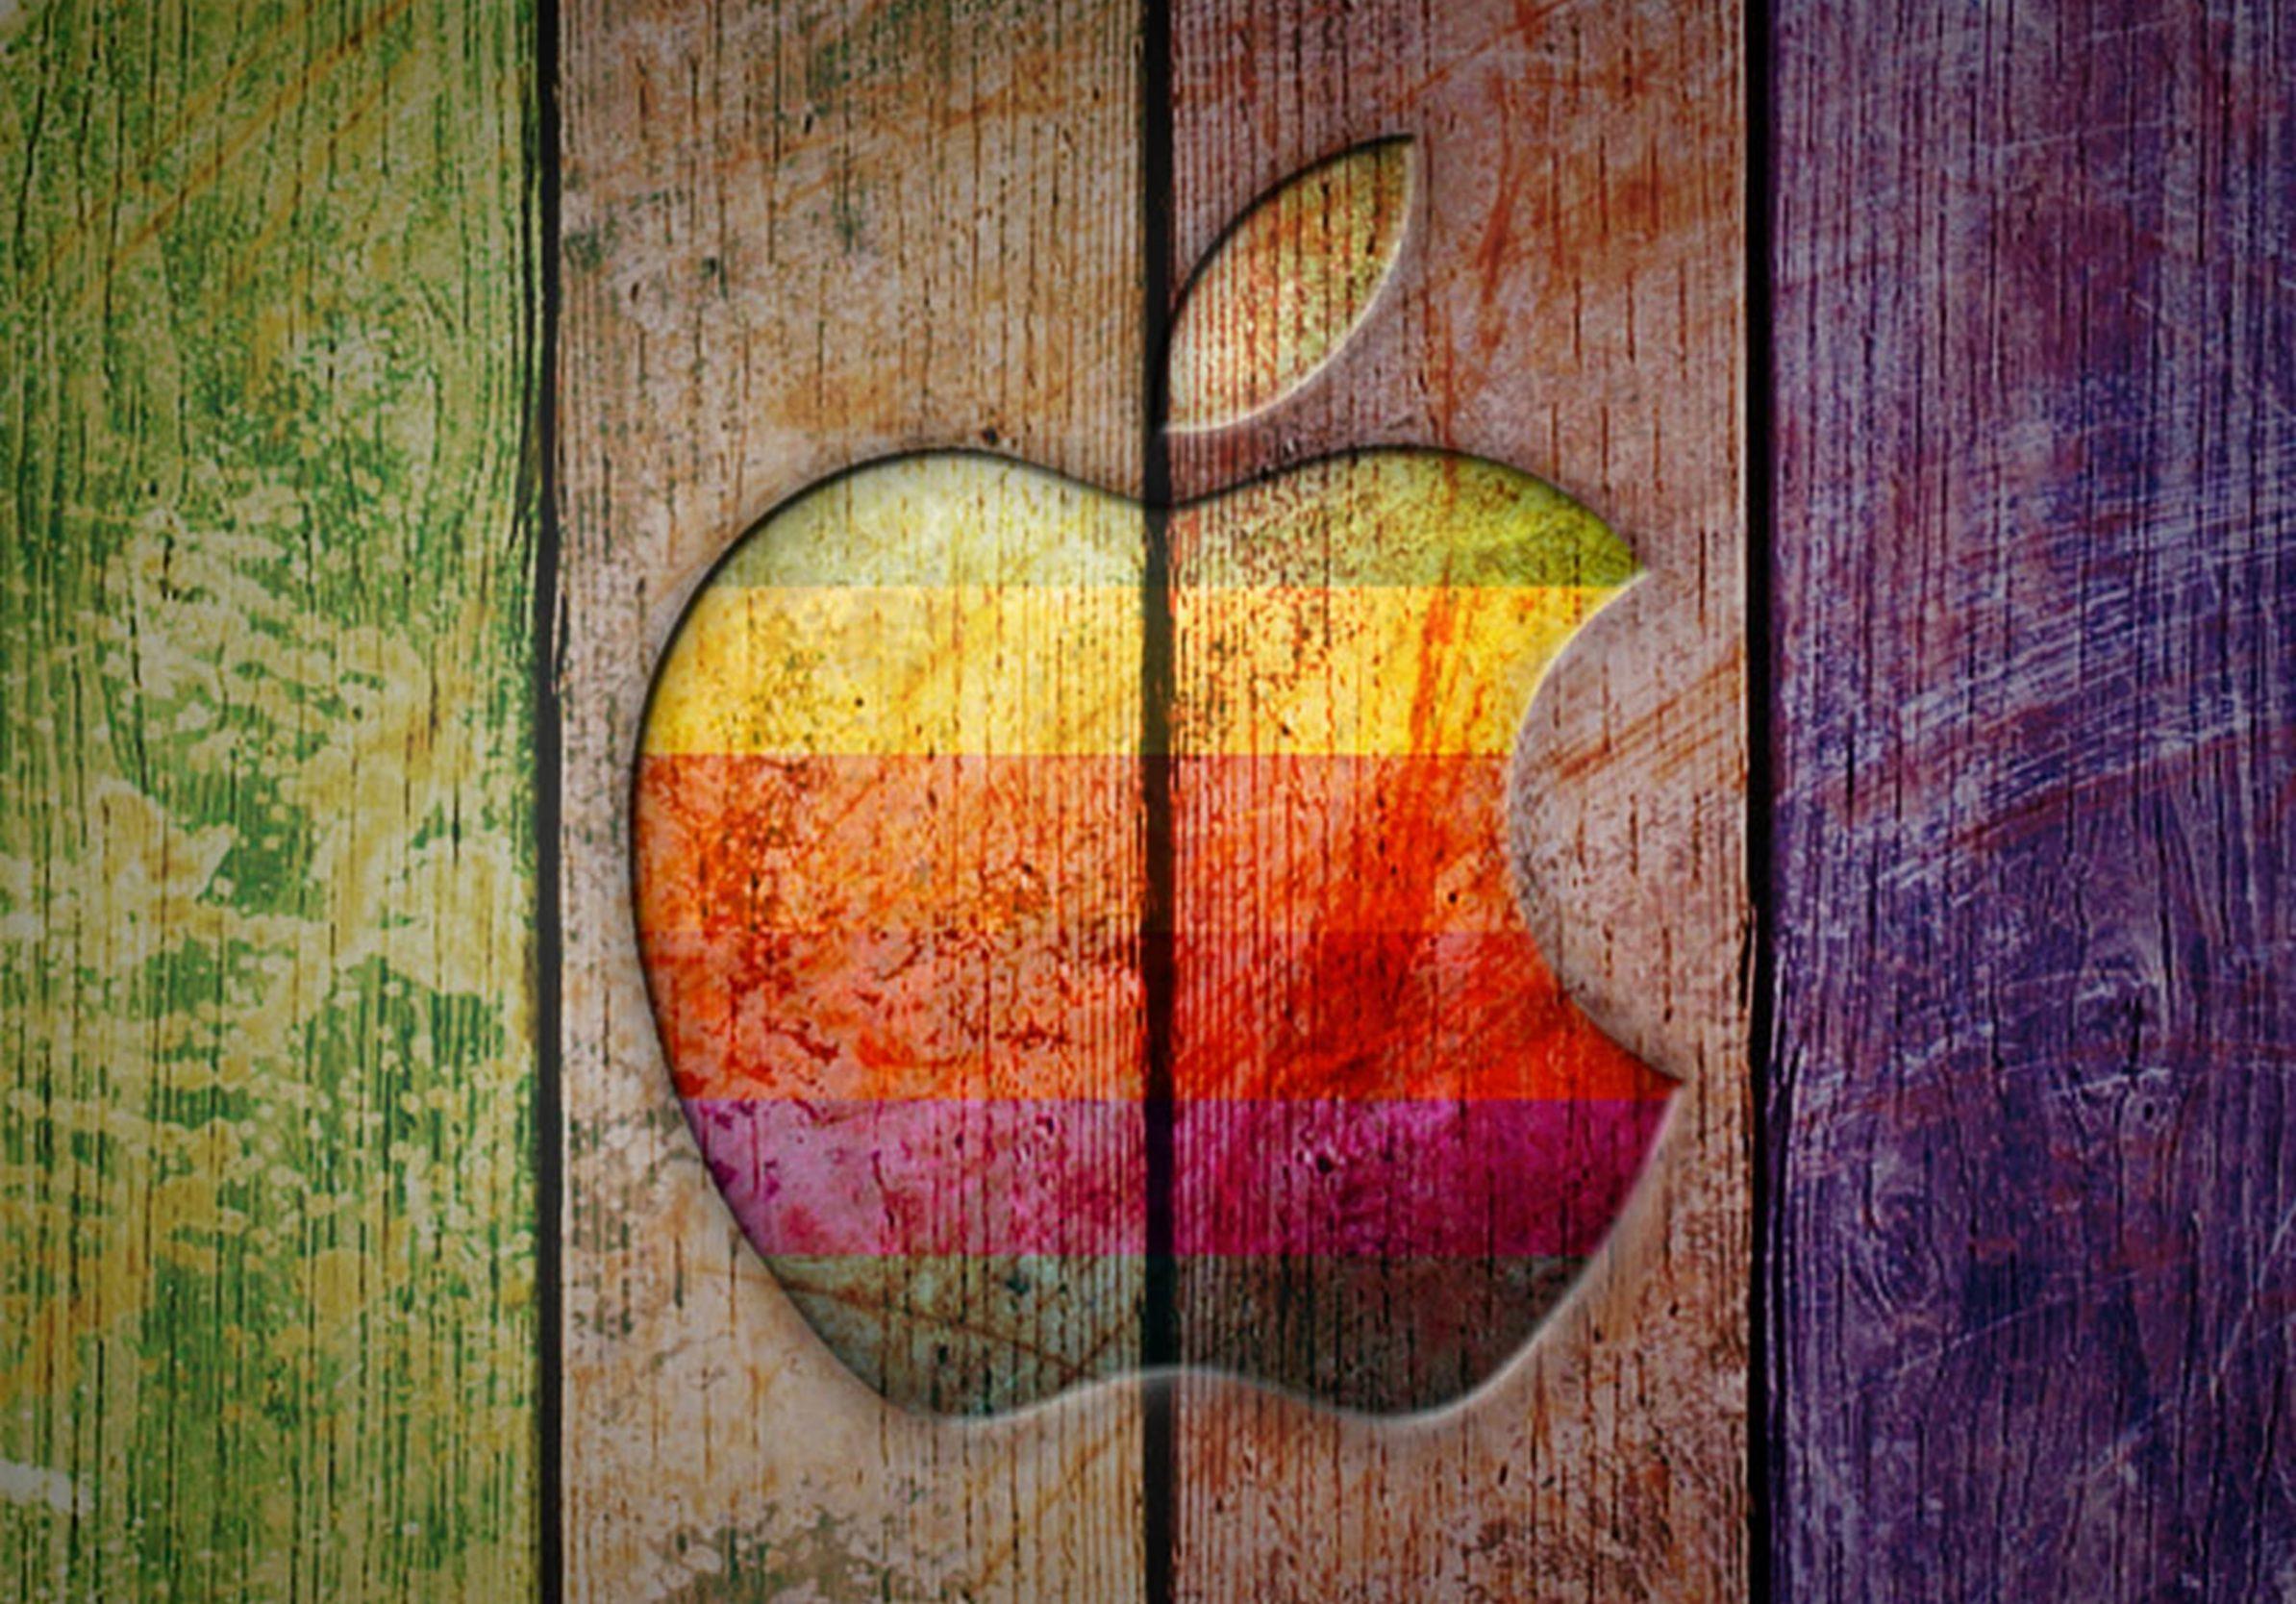 2388x1668 iPad Pro wallpapers Apple Logo on Colorful Wood Ipad Wallpaper 2388x1668 pixels resolution